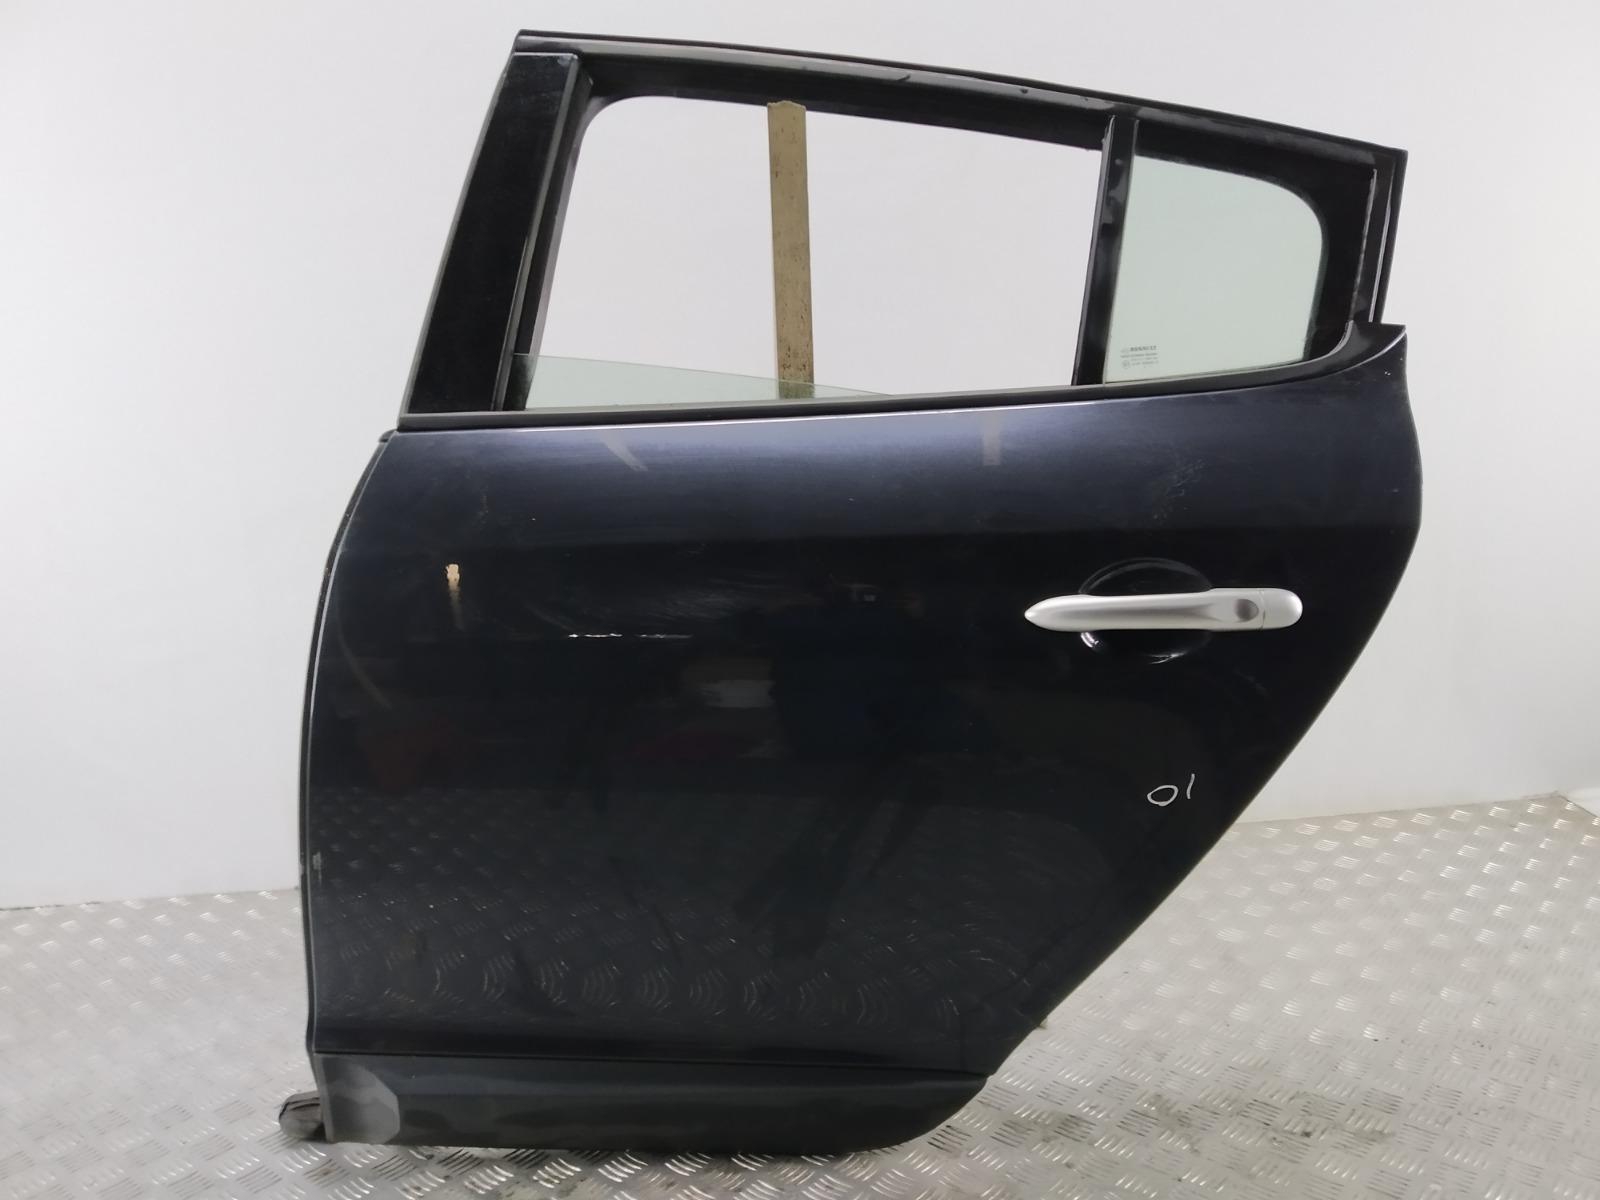 Дверь задняя левая Renault Megane 1.6 I 2011 (б/у)